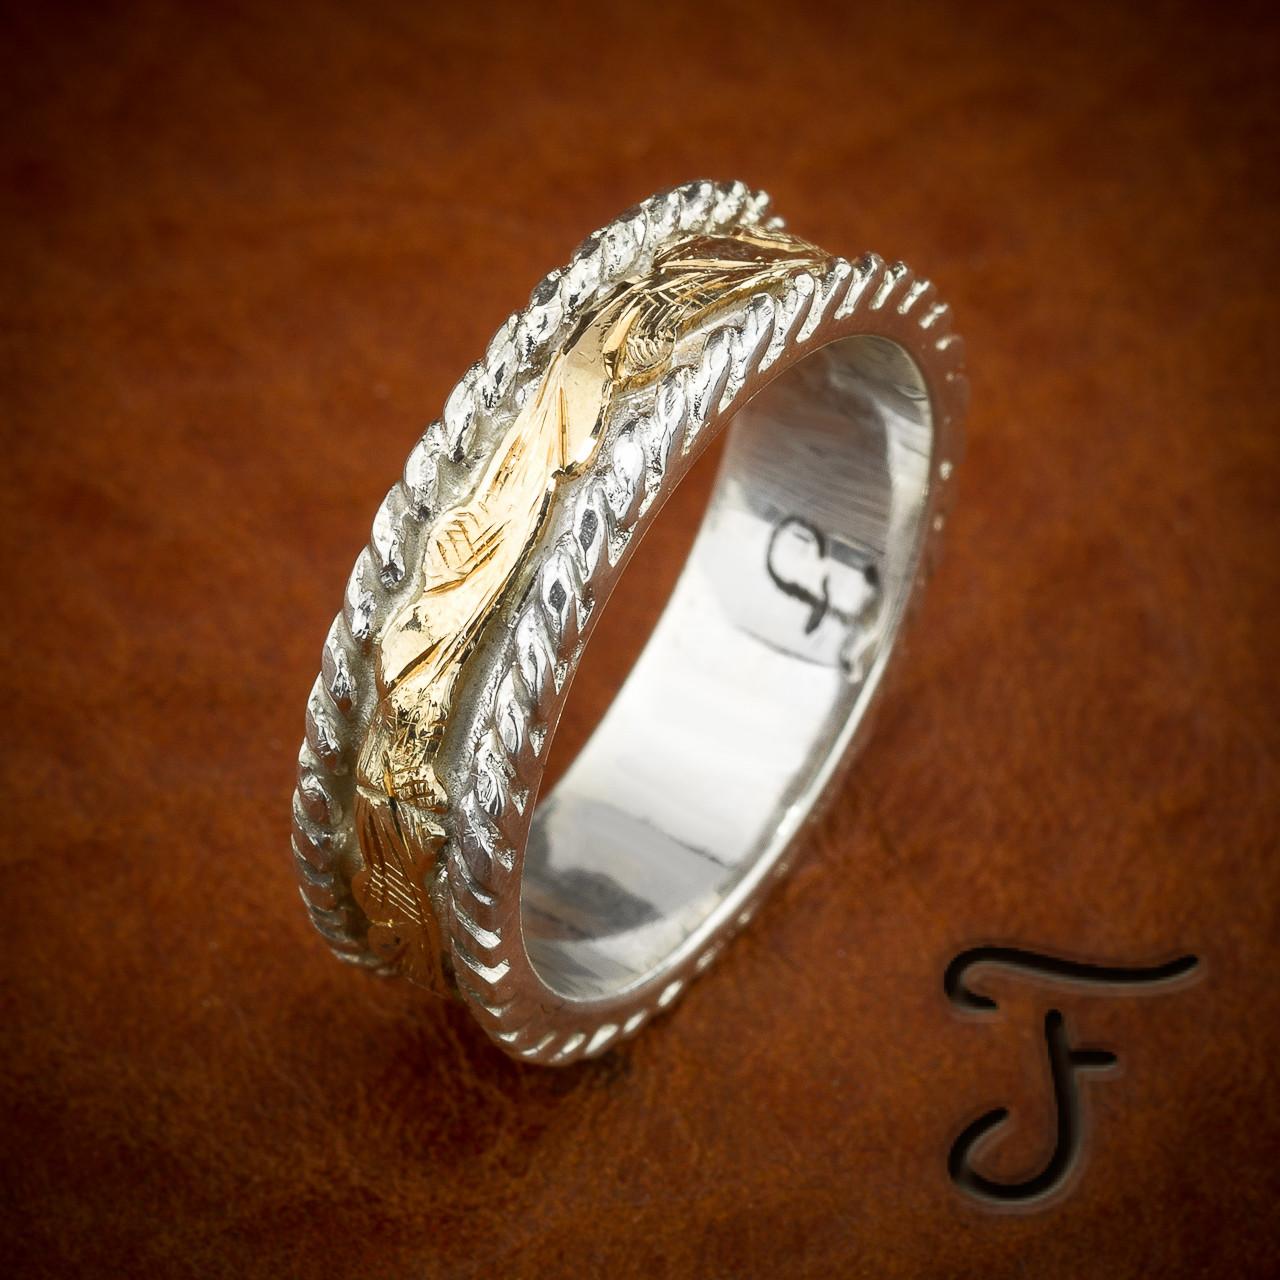 Image 1: Handmade Western Style Wedding Rings At Reisefeber.org